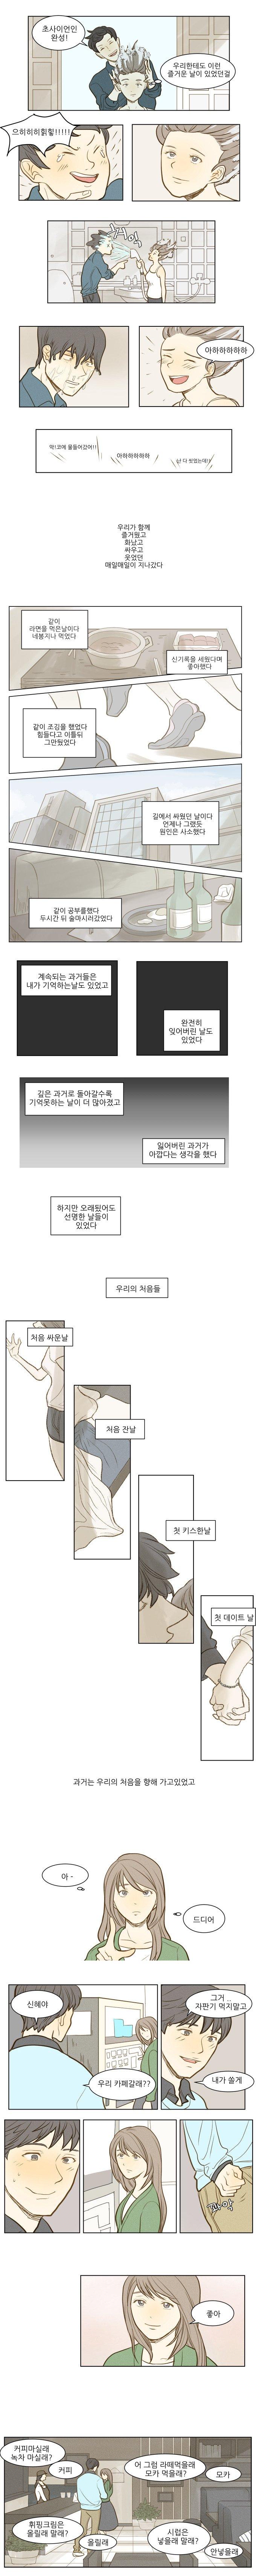 6.jpg 시간은 거꾸로 흐른다.manga [BGM] 시간은 거꾸로 간다.manhwa